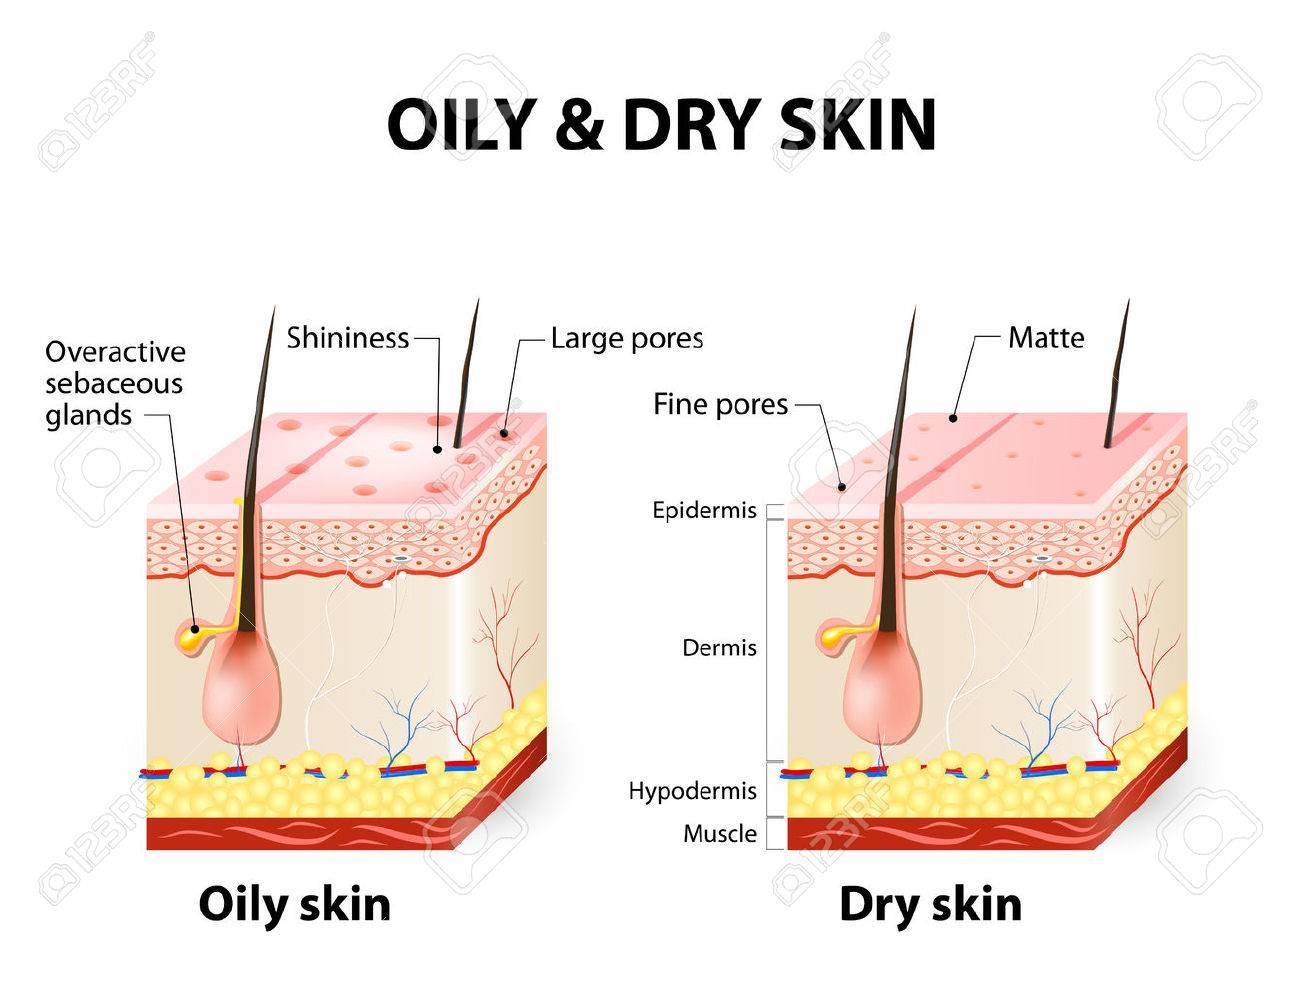 http://n3.datasn.io/data/api/v1/n3zm/image_of_skin_disease_5/by_table/skin_disease_image_download_access/7c/e9/19/eb/7ce919eb21d3f9756d1988e8f864bbc049e84af1.jpg